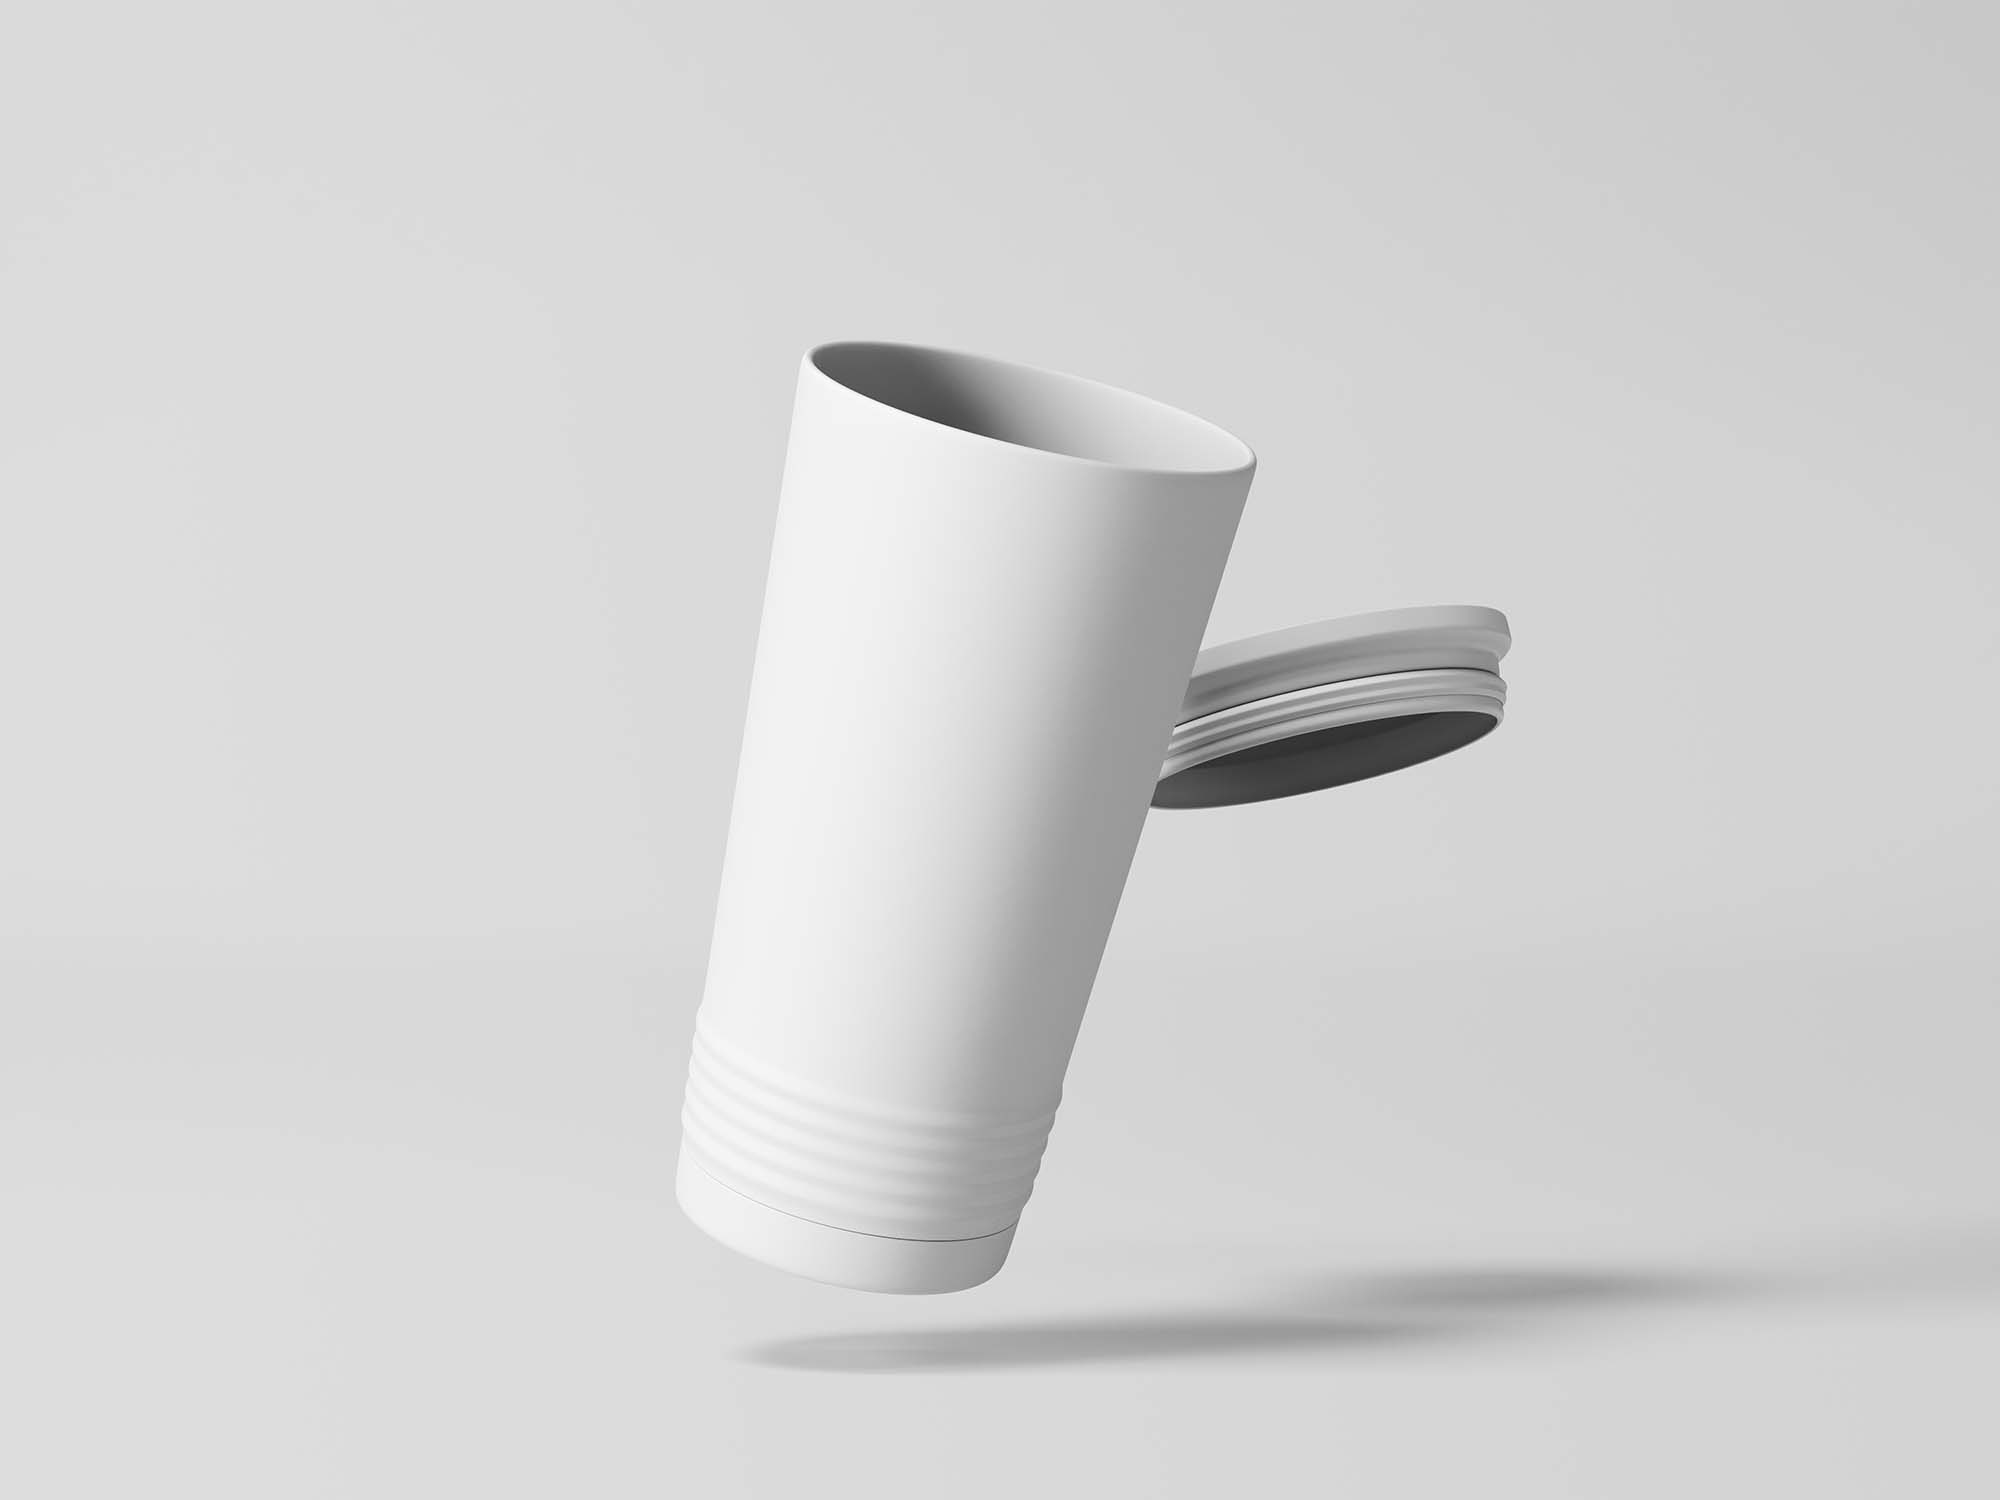 Tumbler Cup Mockup 2